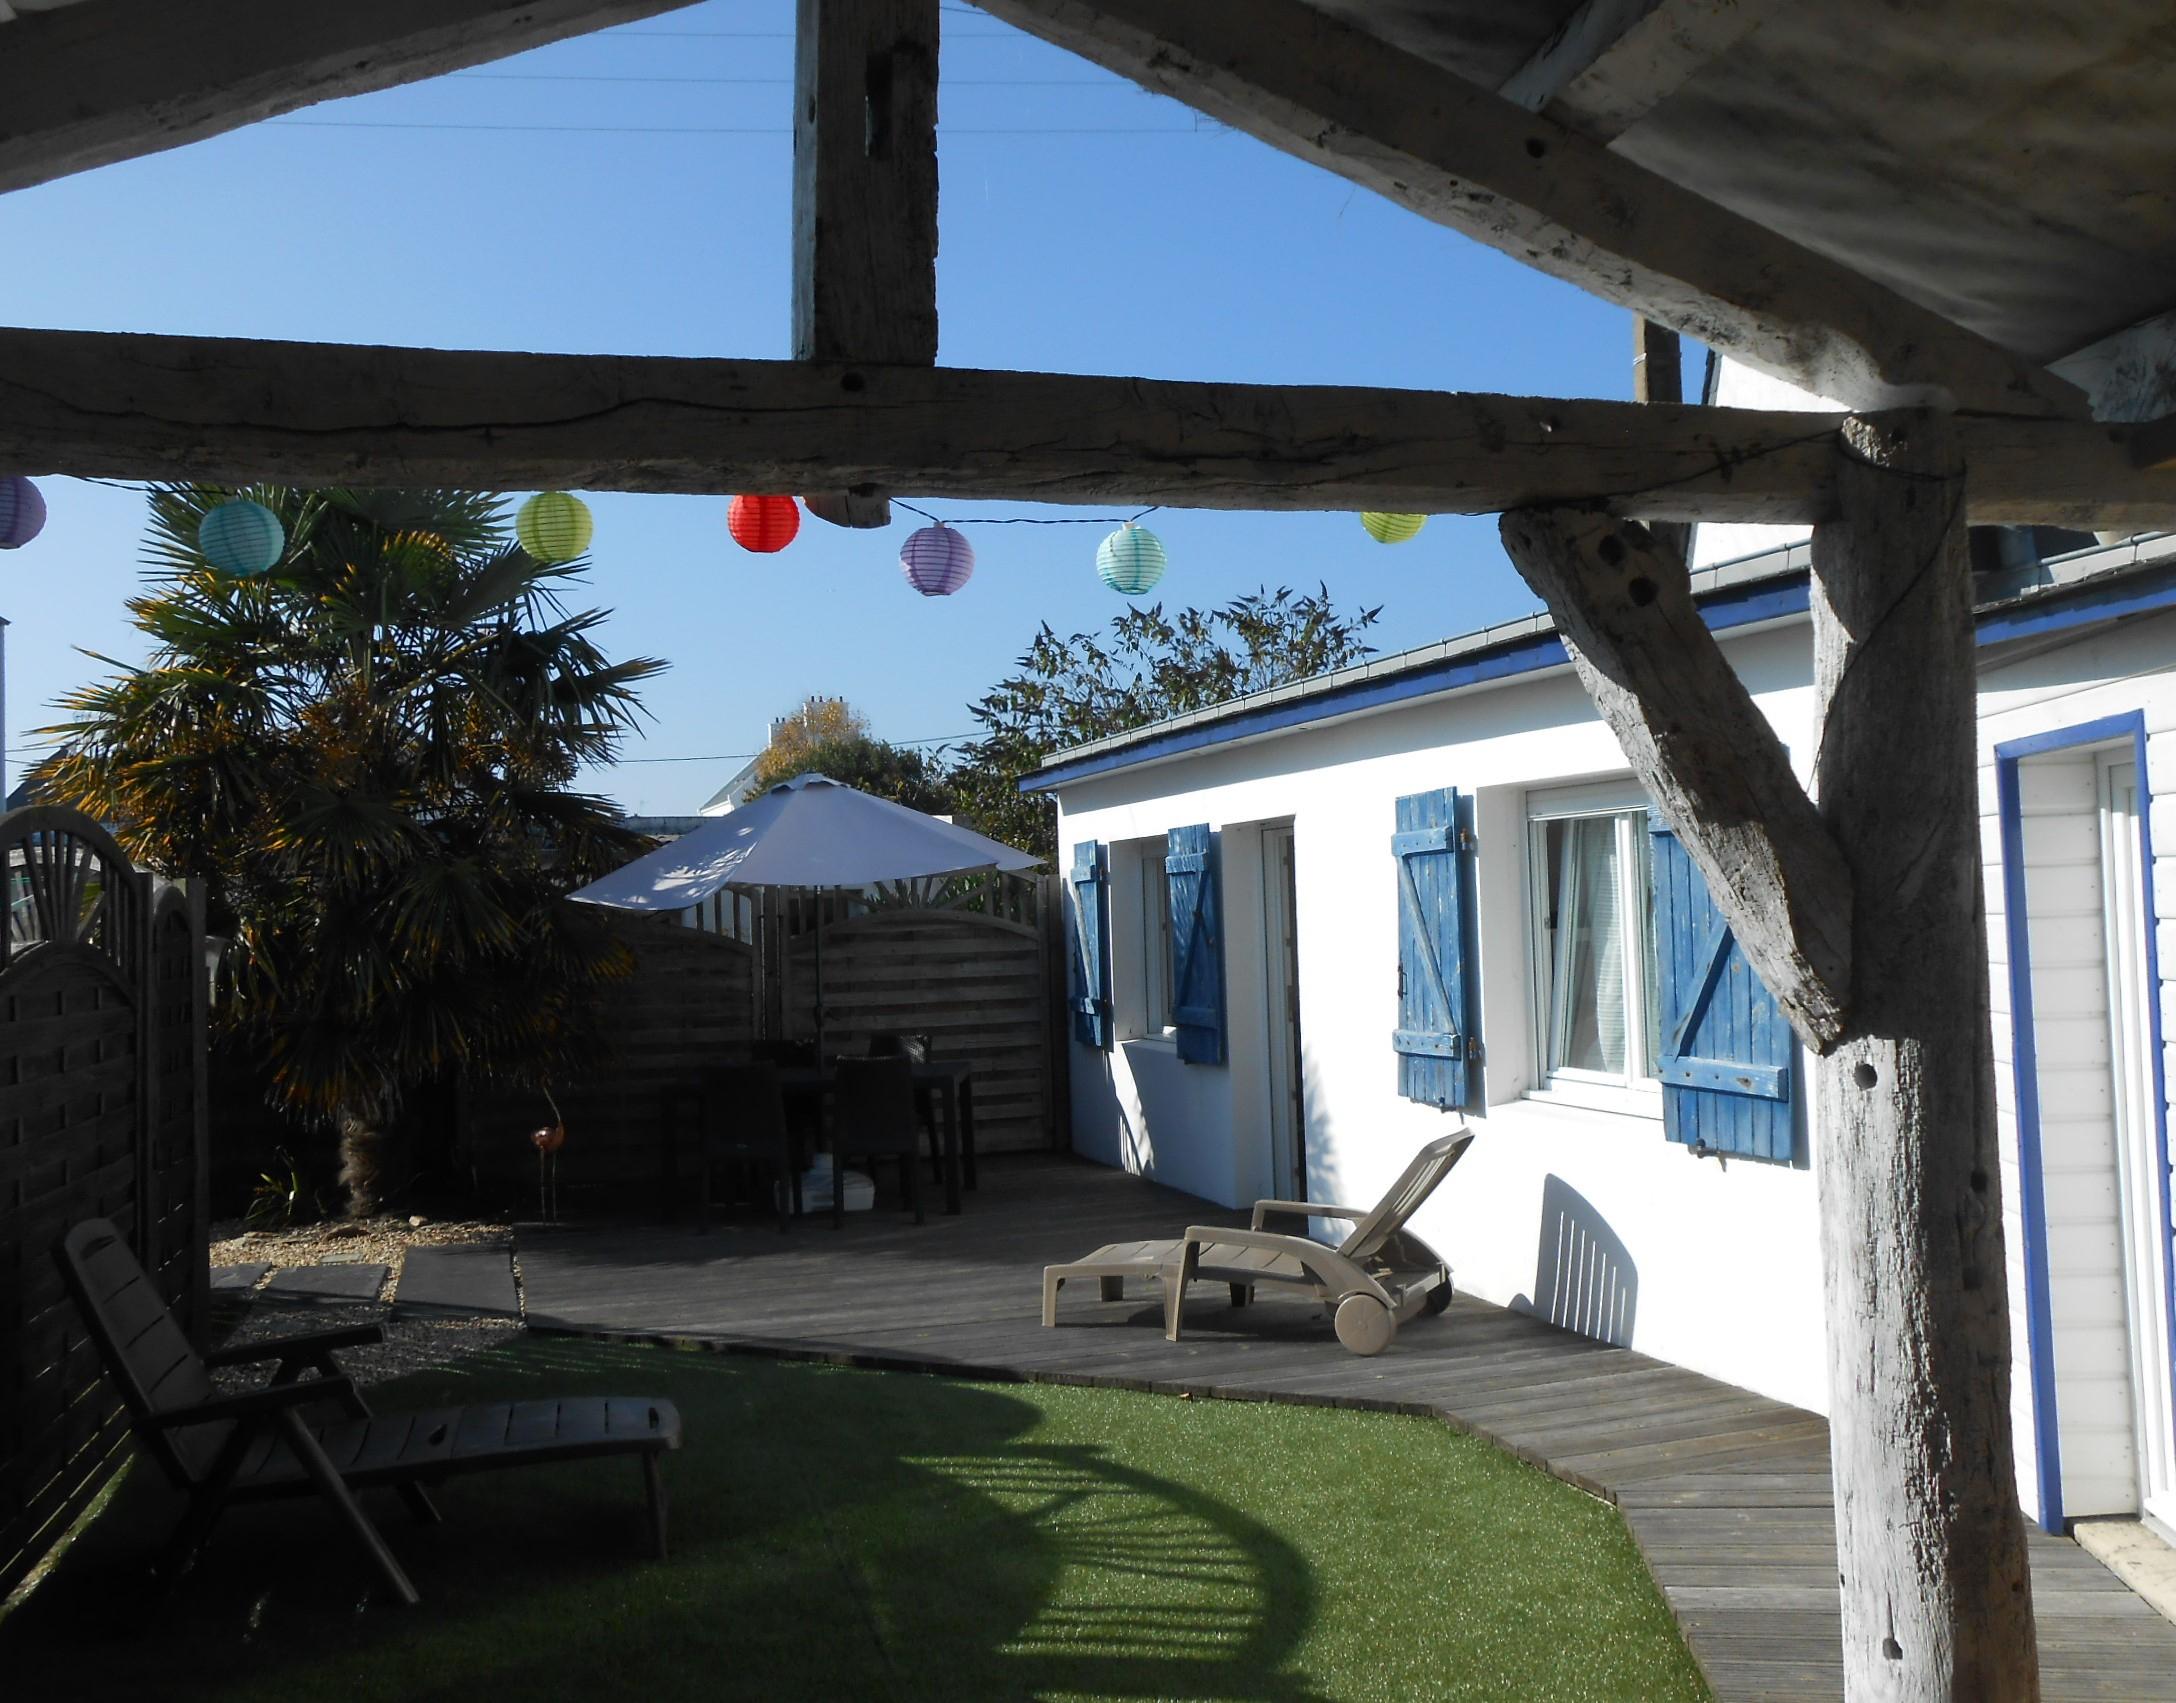 Hamon Anita - Maison 3 Personnes pour Paillote Jardin